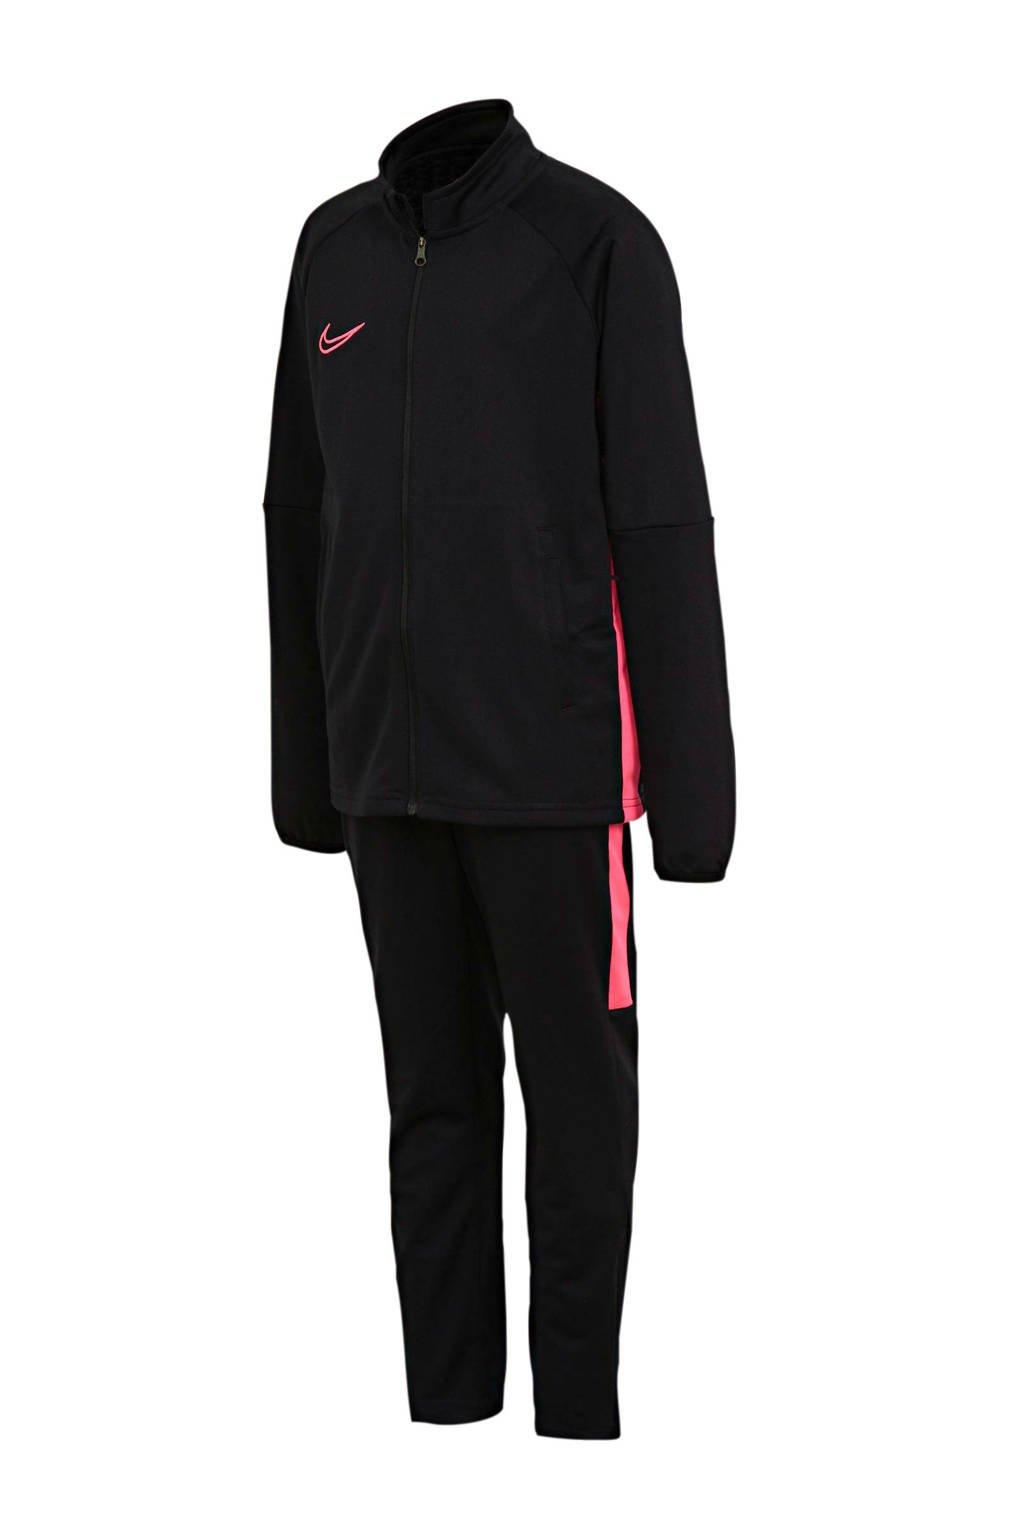 Nike Junior  trainingspak zwart/roze, Zwart/roze